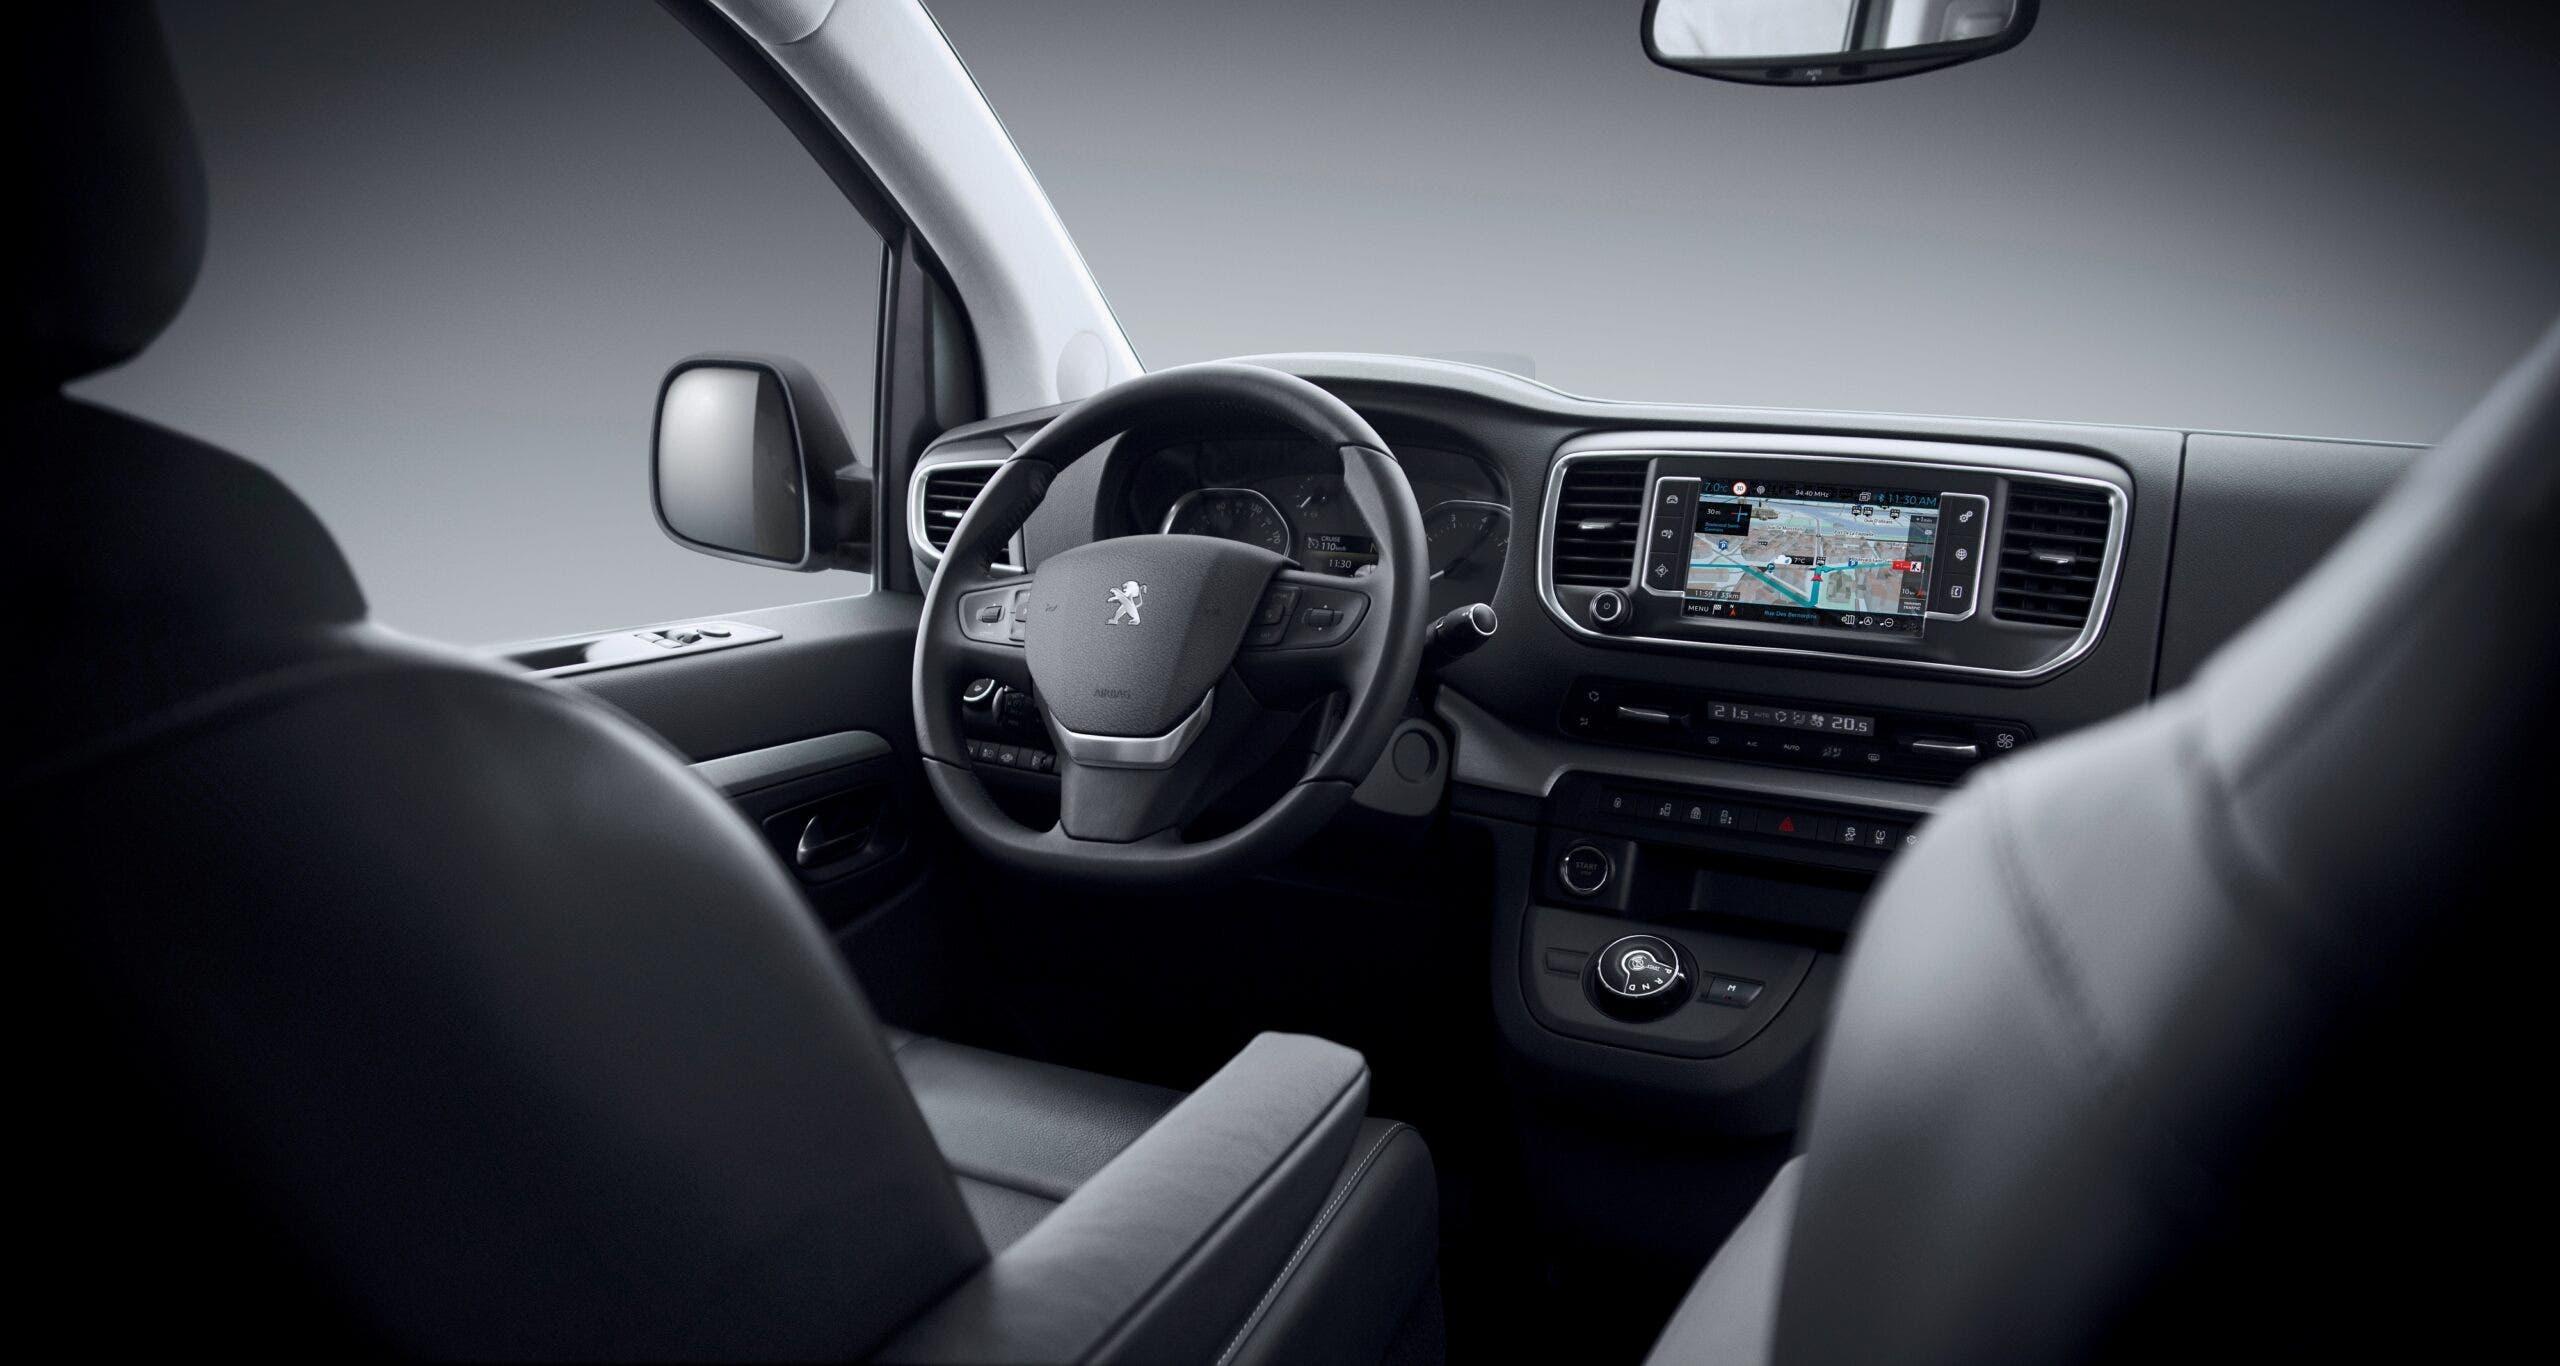 Peugeot Traveller BlueHDi 140